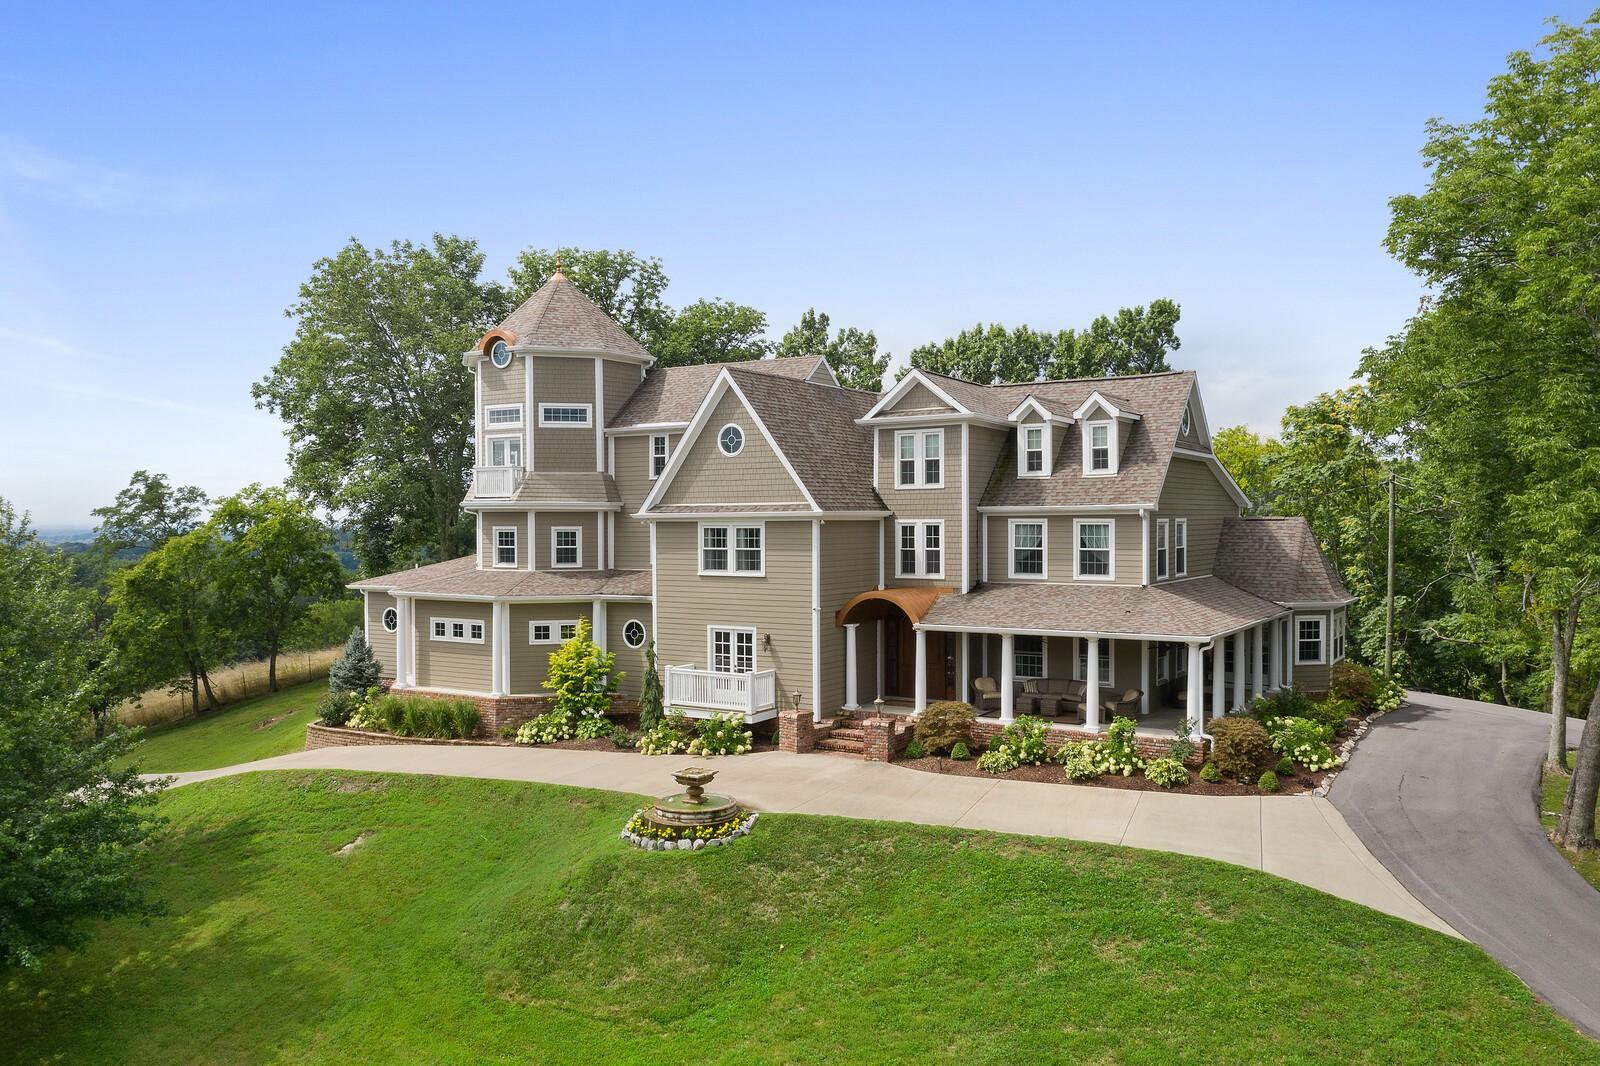 1125 Hitt Ln Property Photo - Goodlettsville, TN real estate listing